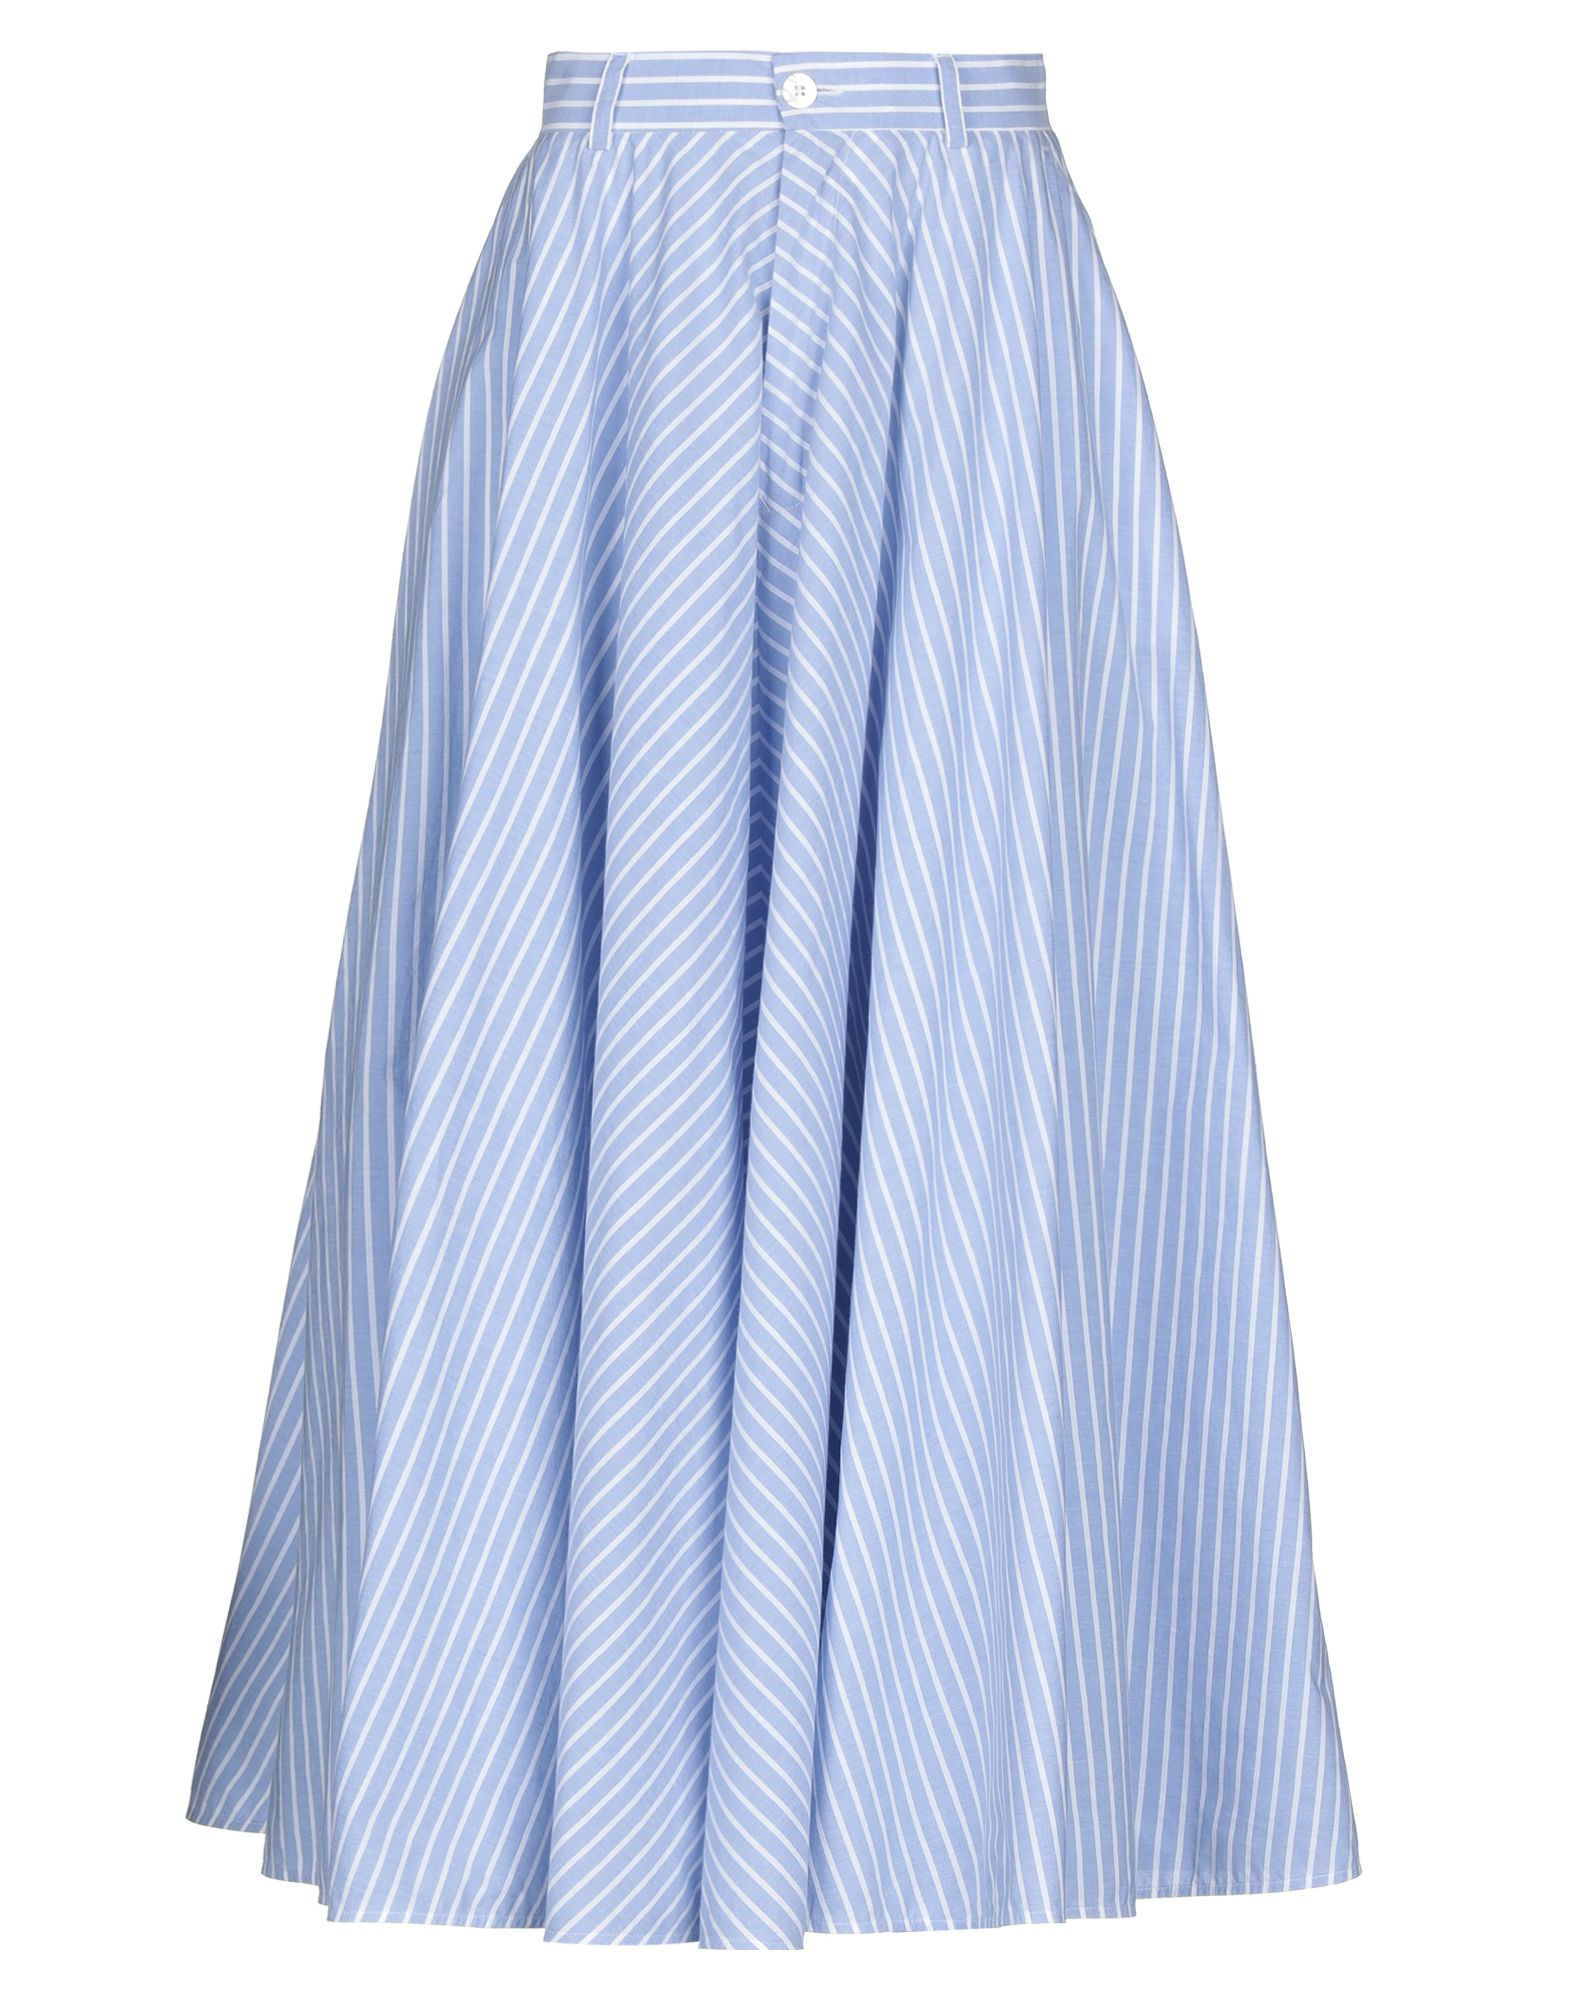 MM6 MAISON MARGIELA Длинная юбка maison margiela длинная юбка